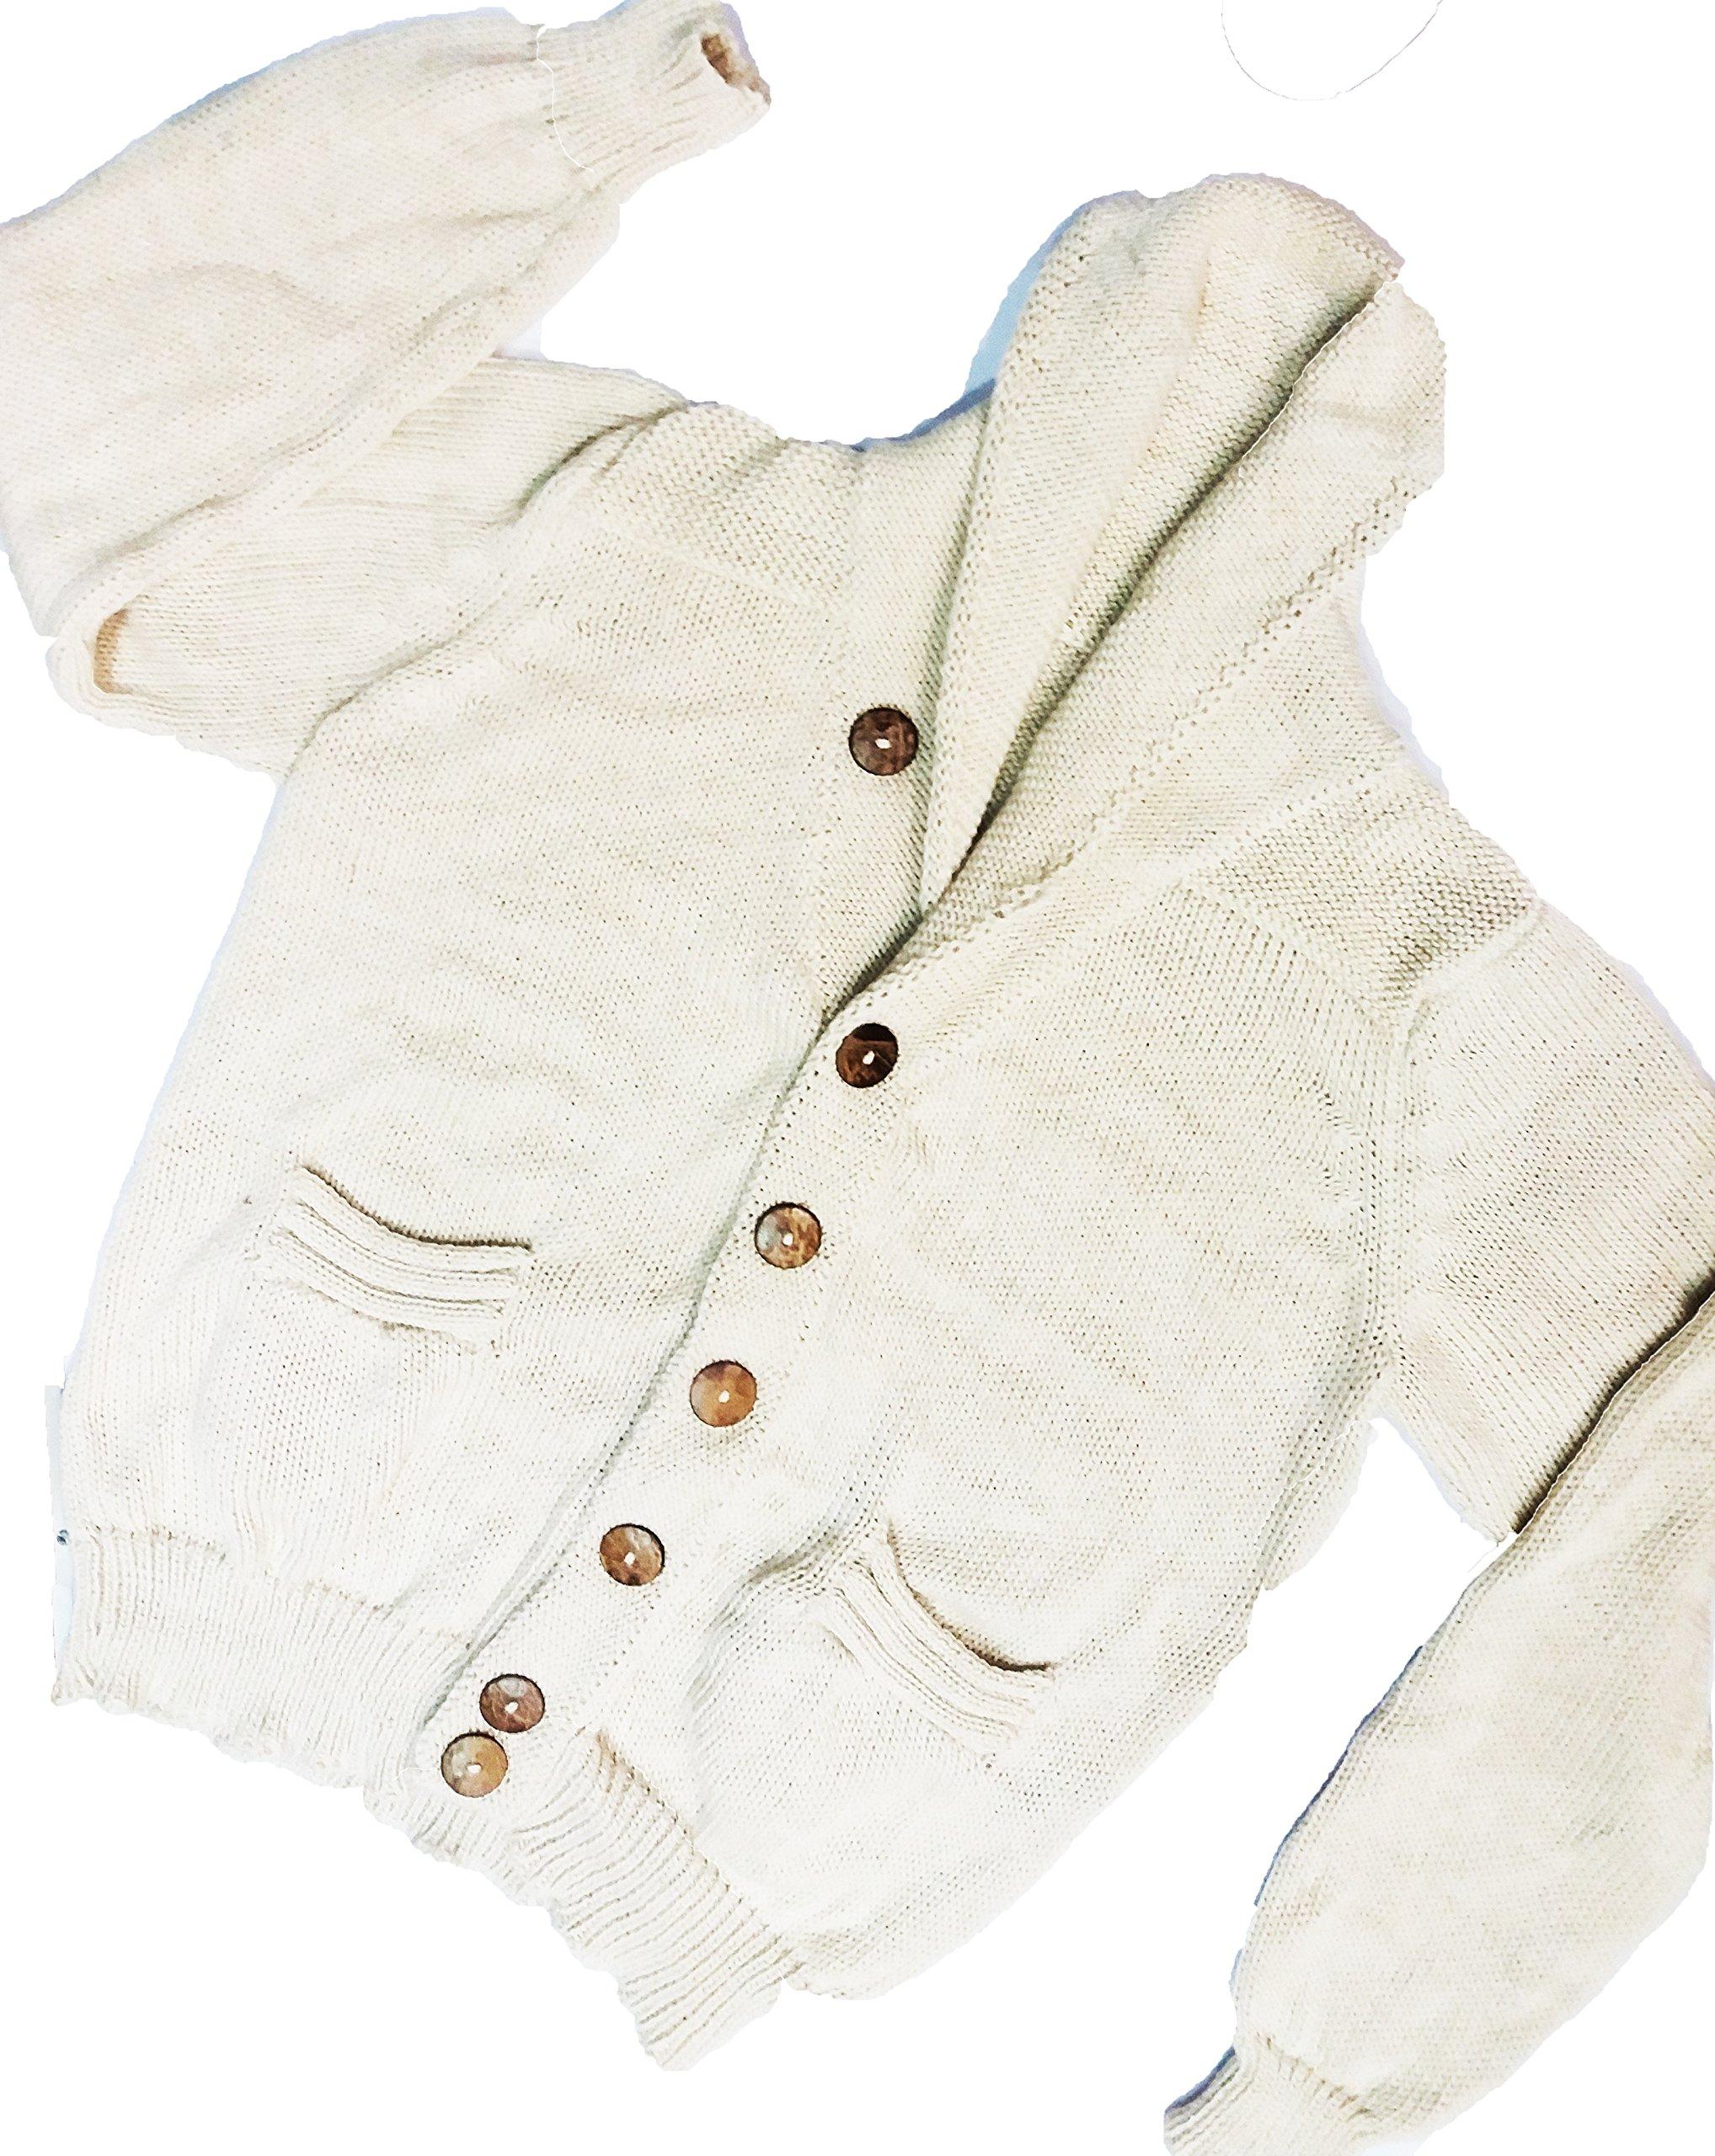 100% Royal Alpaca Charcoal Shawl Collar Cardigan, White/Ivory, Handmade XXXL